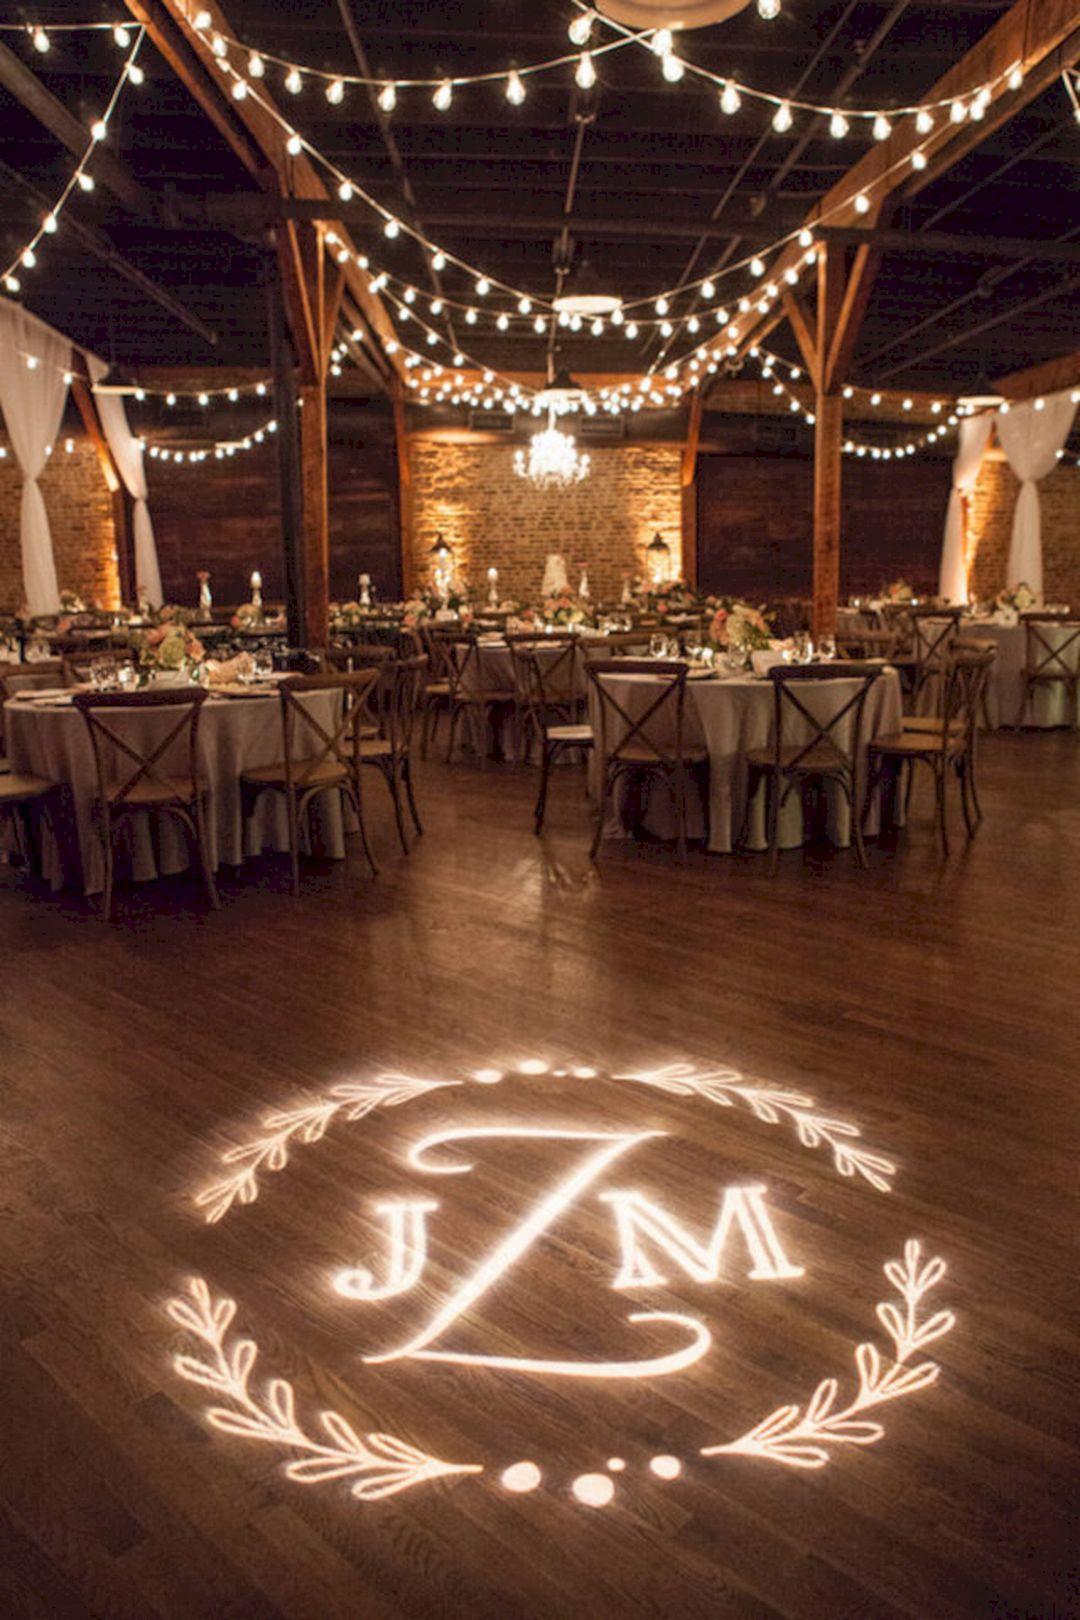 12 Incredible Wedding Lighting Ideas For Romantic Wedding Party Wedding Lights Rustic Barn Wedding Barn Wedding Reception